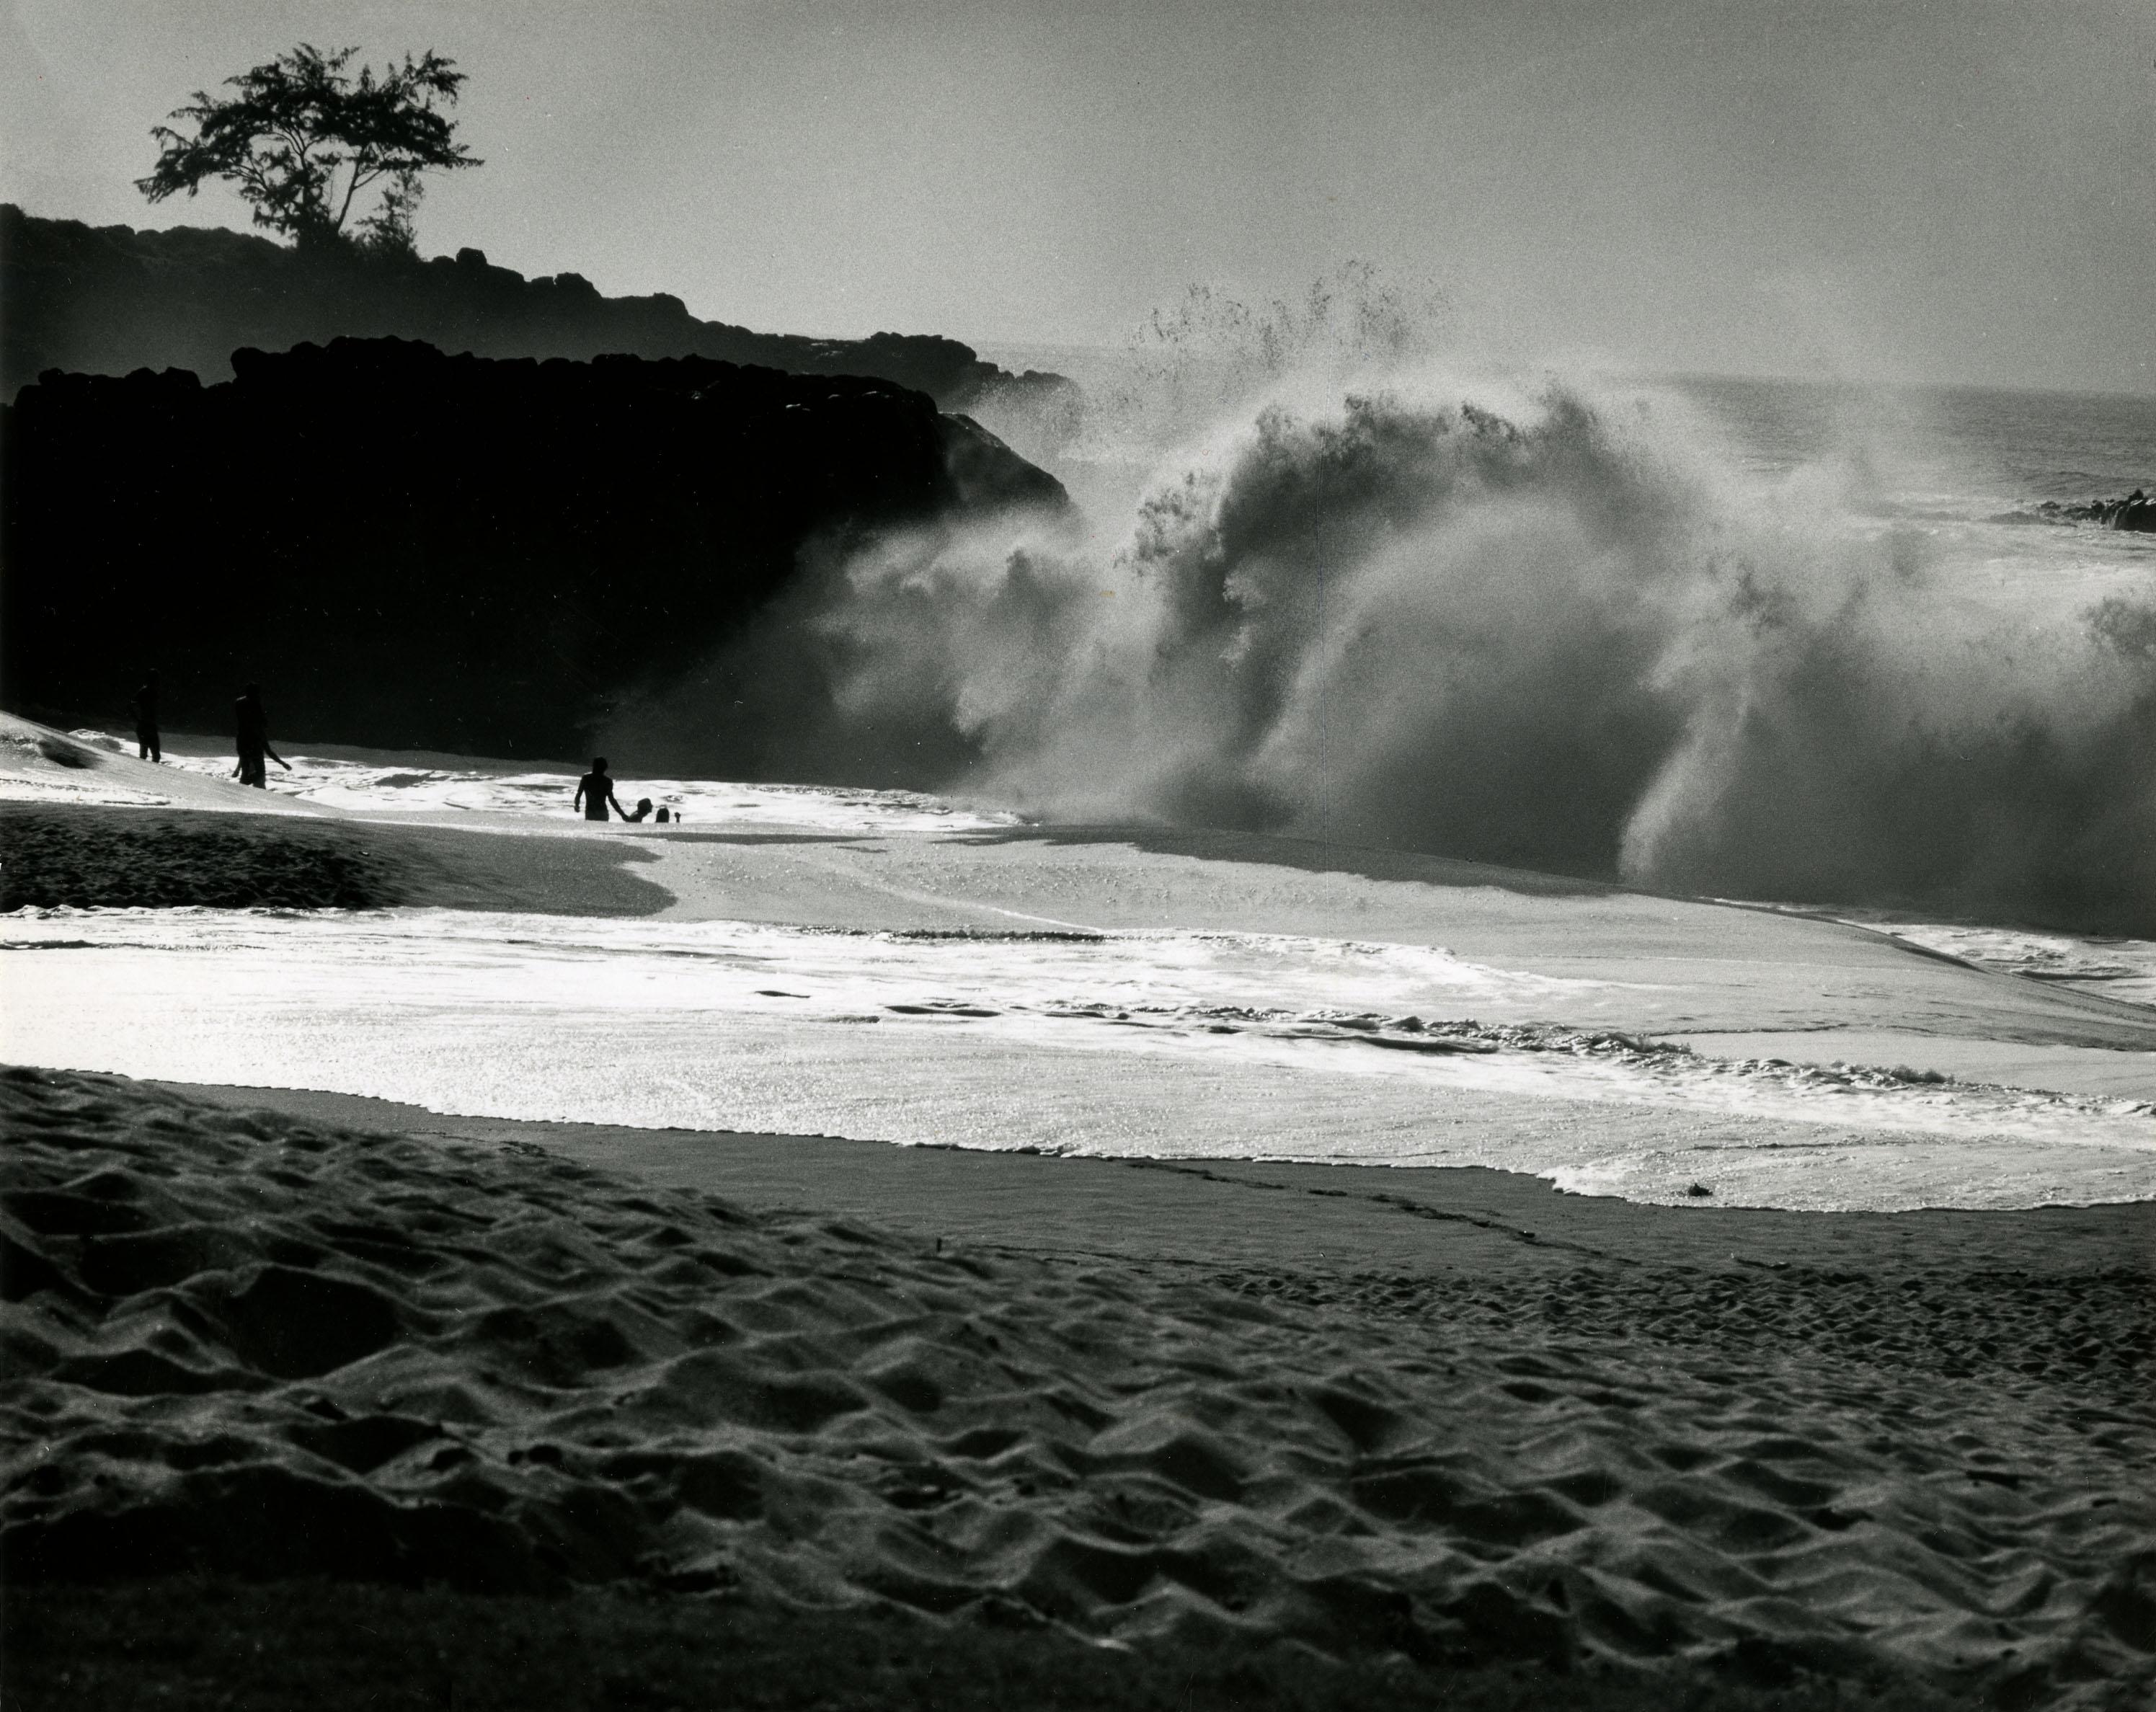 Fotó: Haár Ferenc: Haragszik a tenger, Hawaii, 1960 k. © Magyar Fotográfiai Múzeum